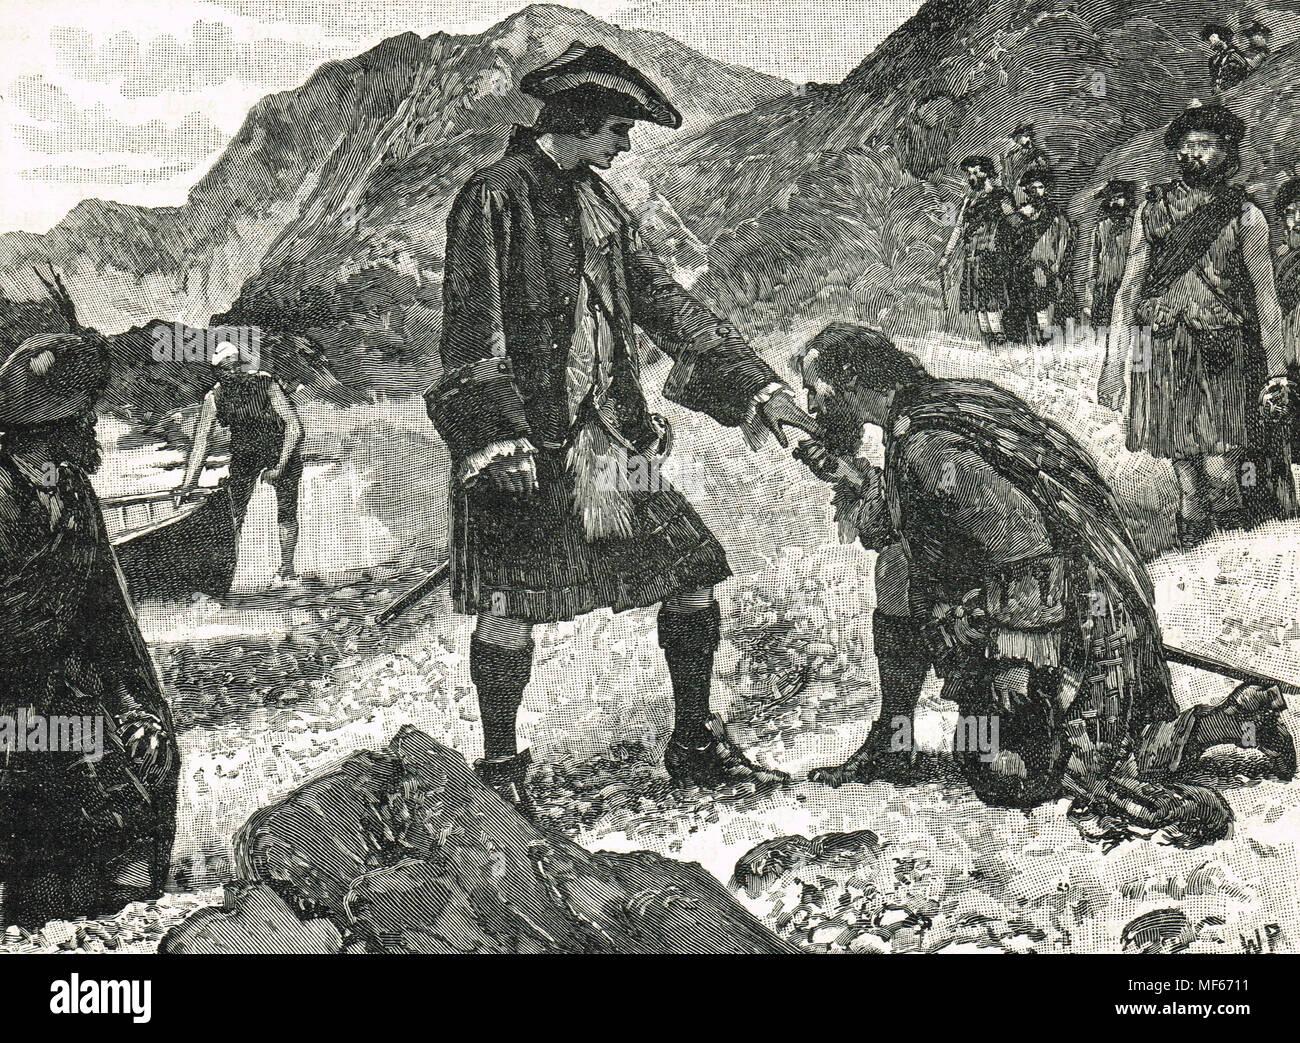 Landing of Bonnie Prince Charlie, Eriskay, 23 July 1745 - Stock Image